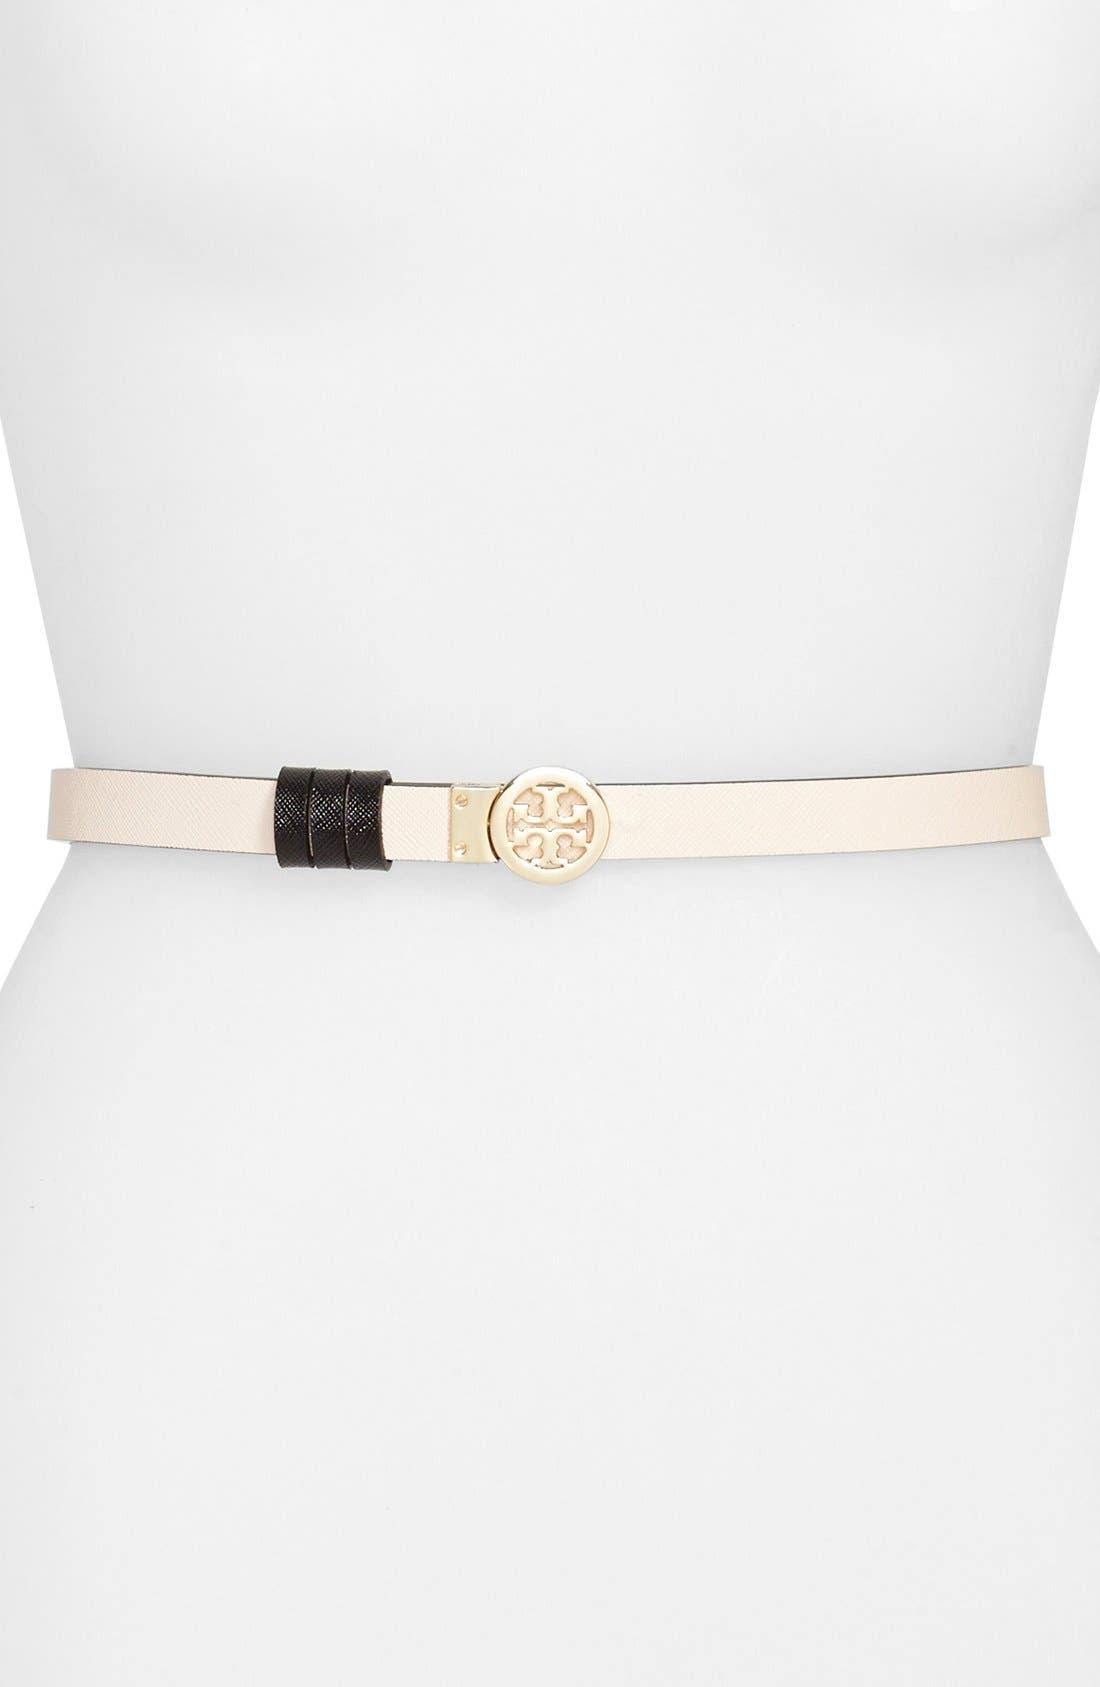 Main Image - Tory Burch Rotating Logo Skinny Leather Belt